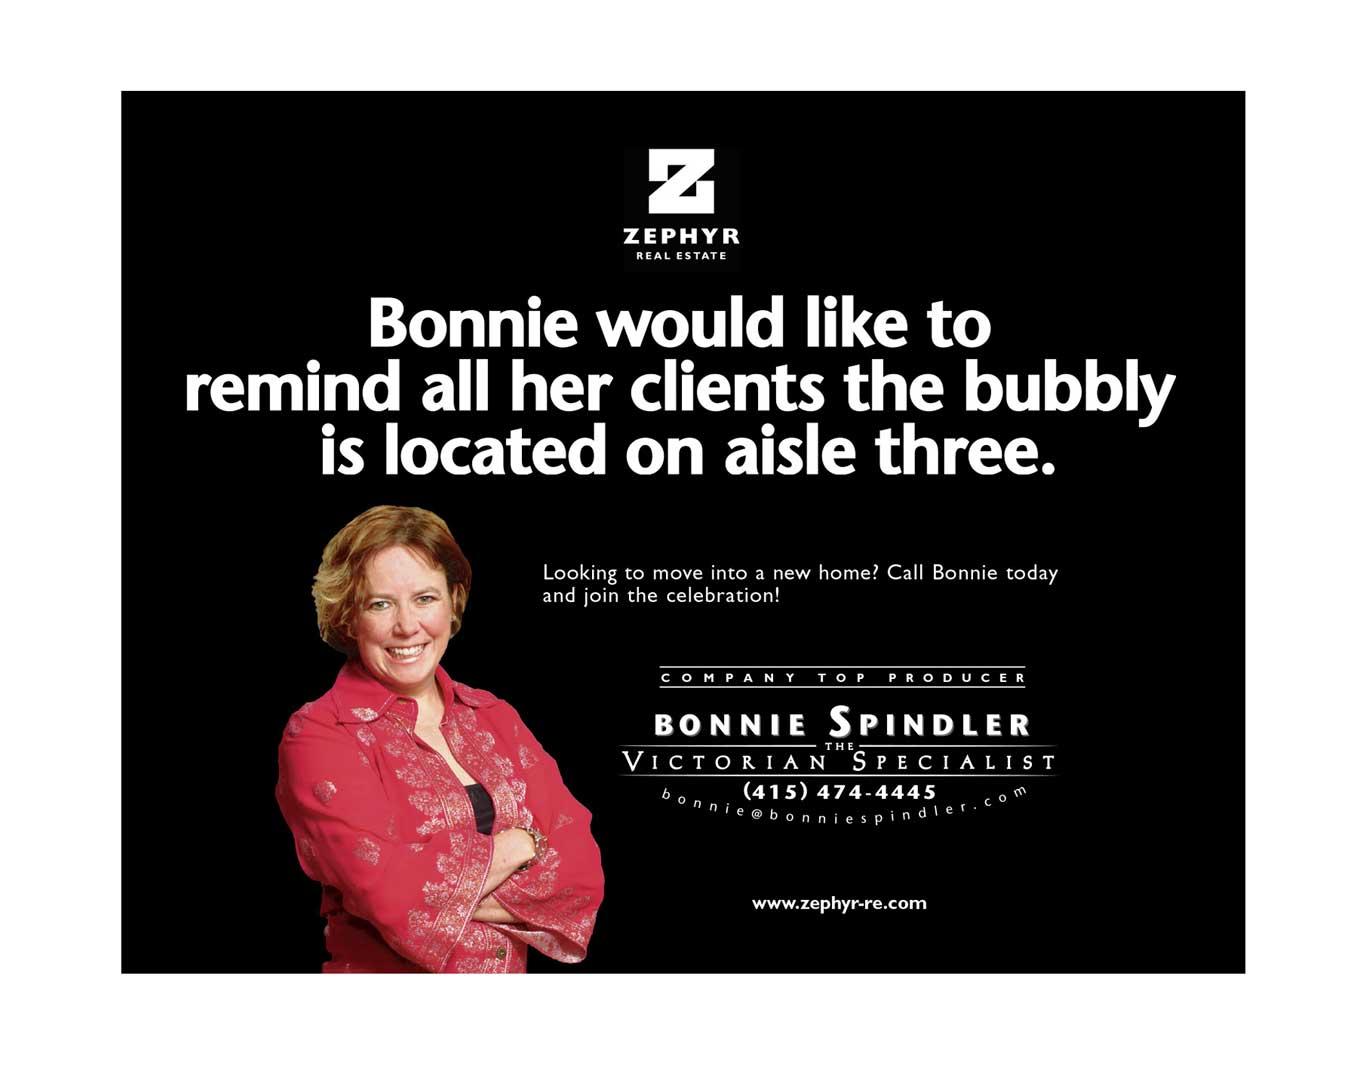 Print- Bonnie Spindler